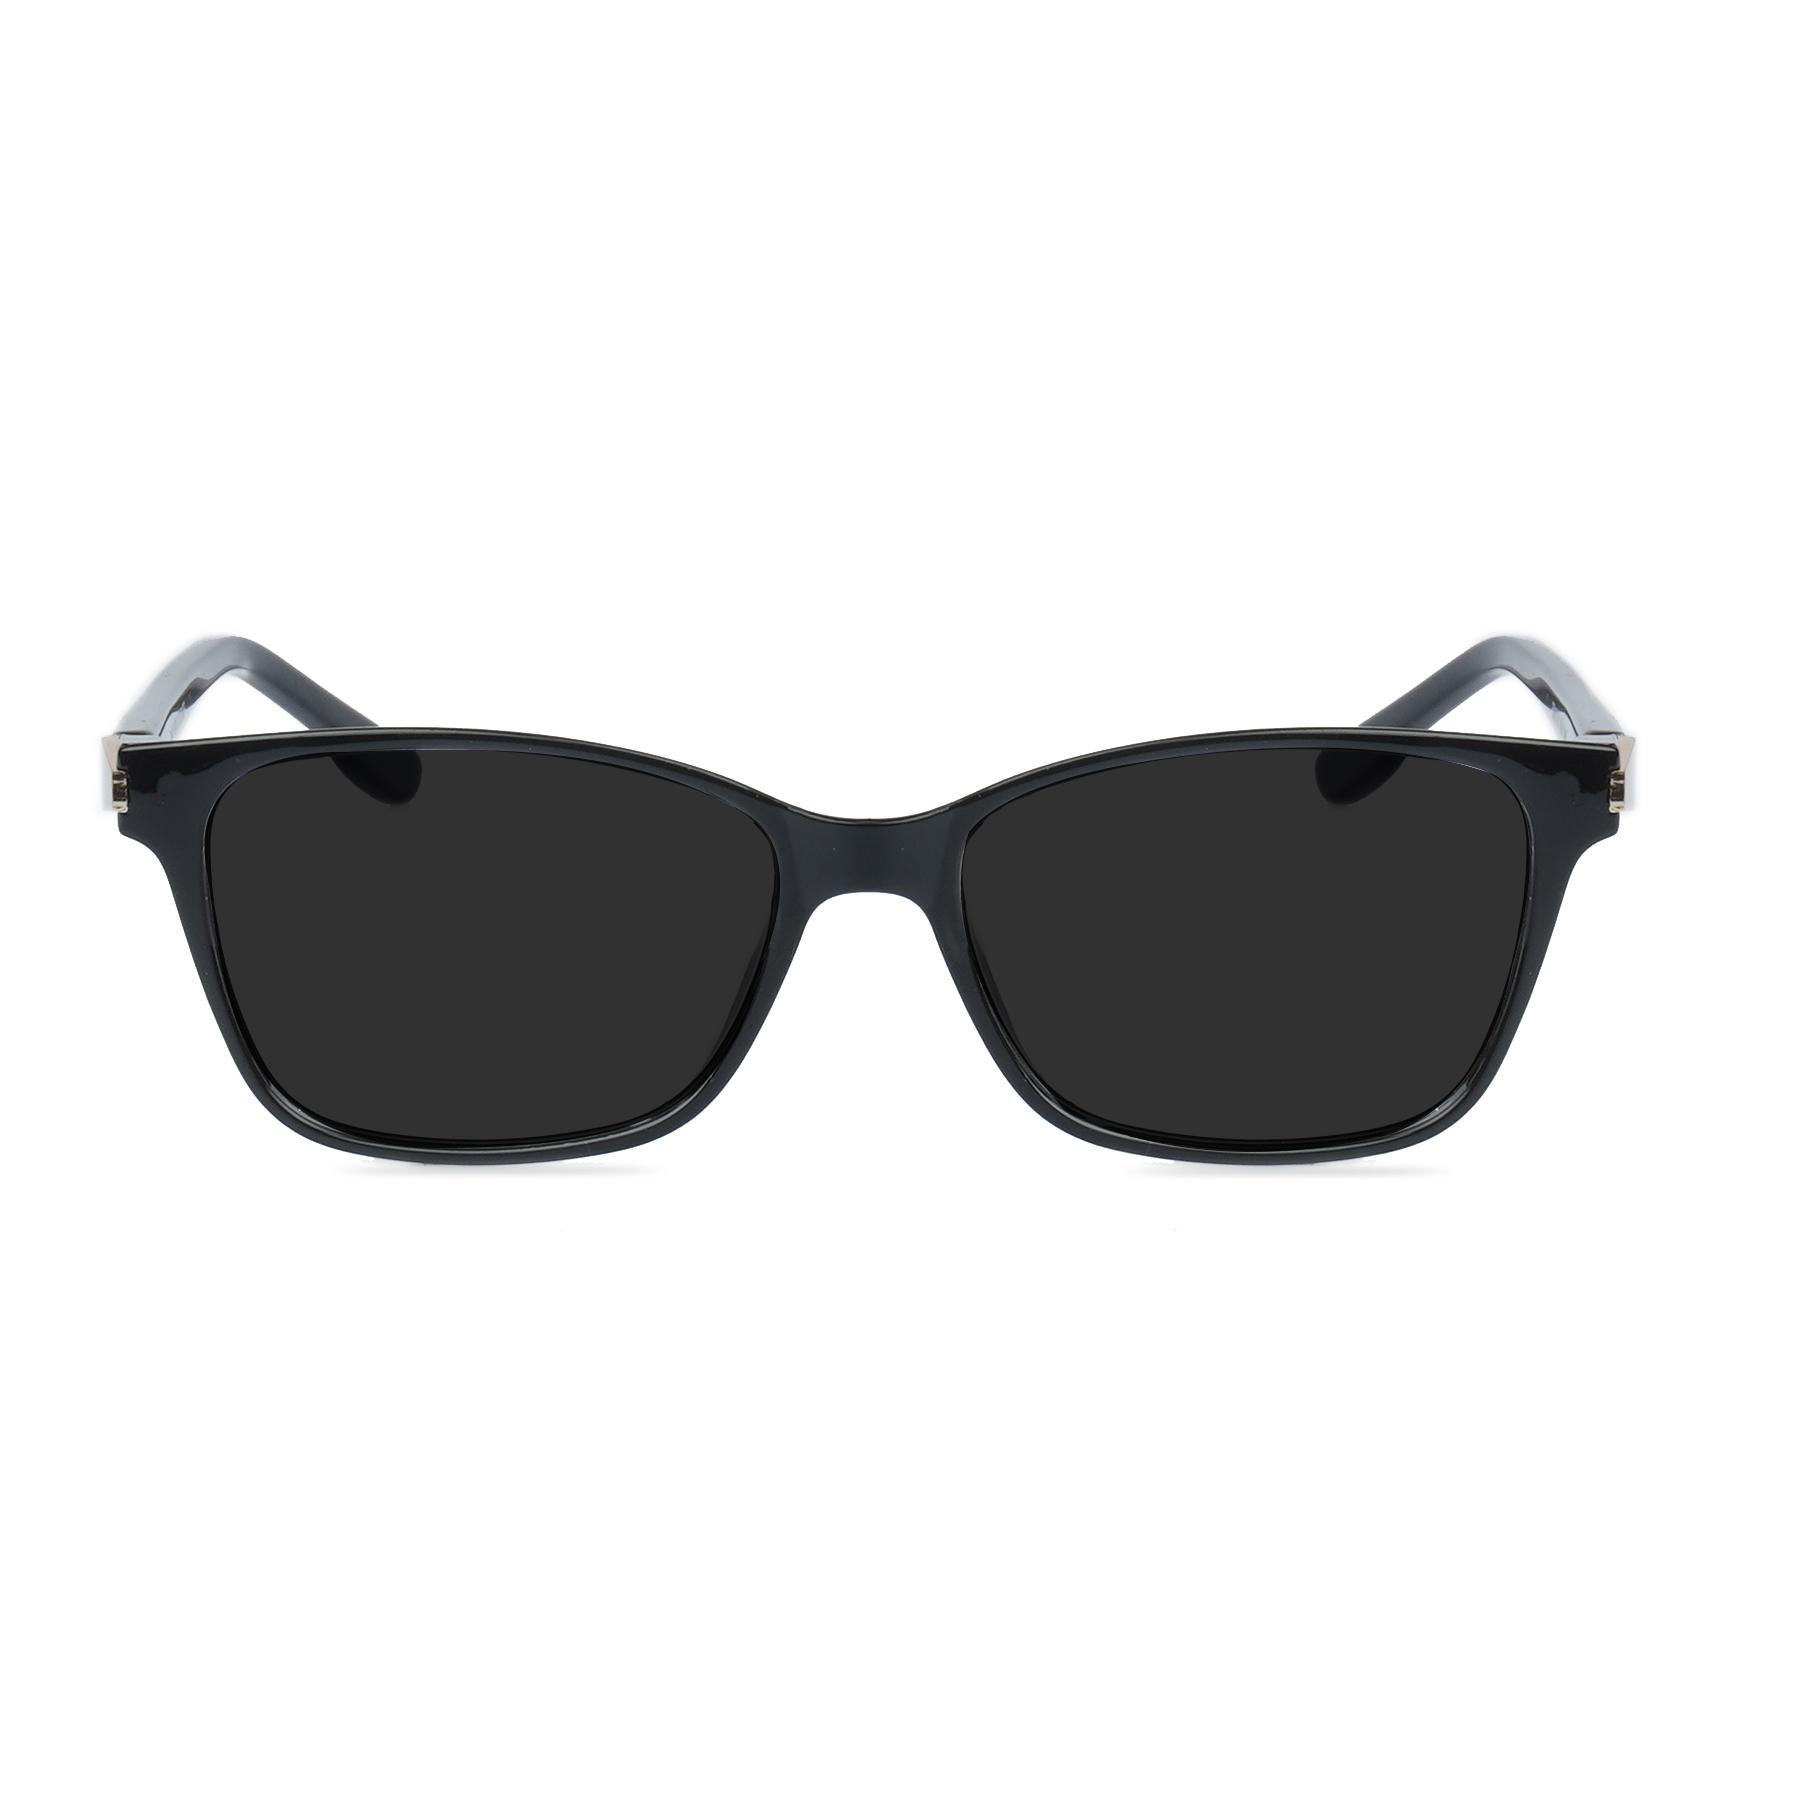 Evoke Paris Sunglasses